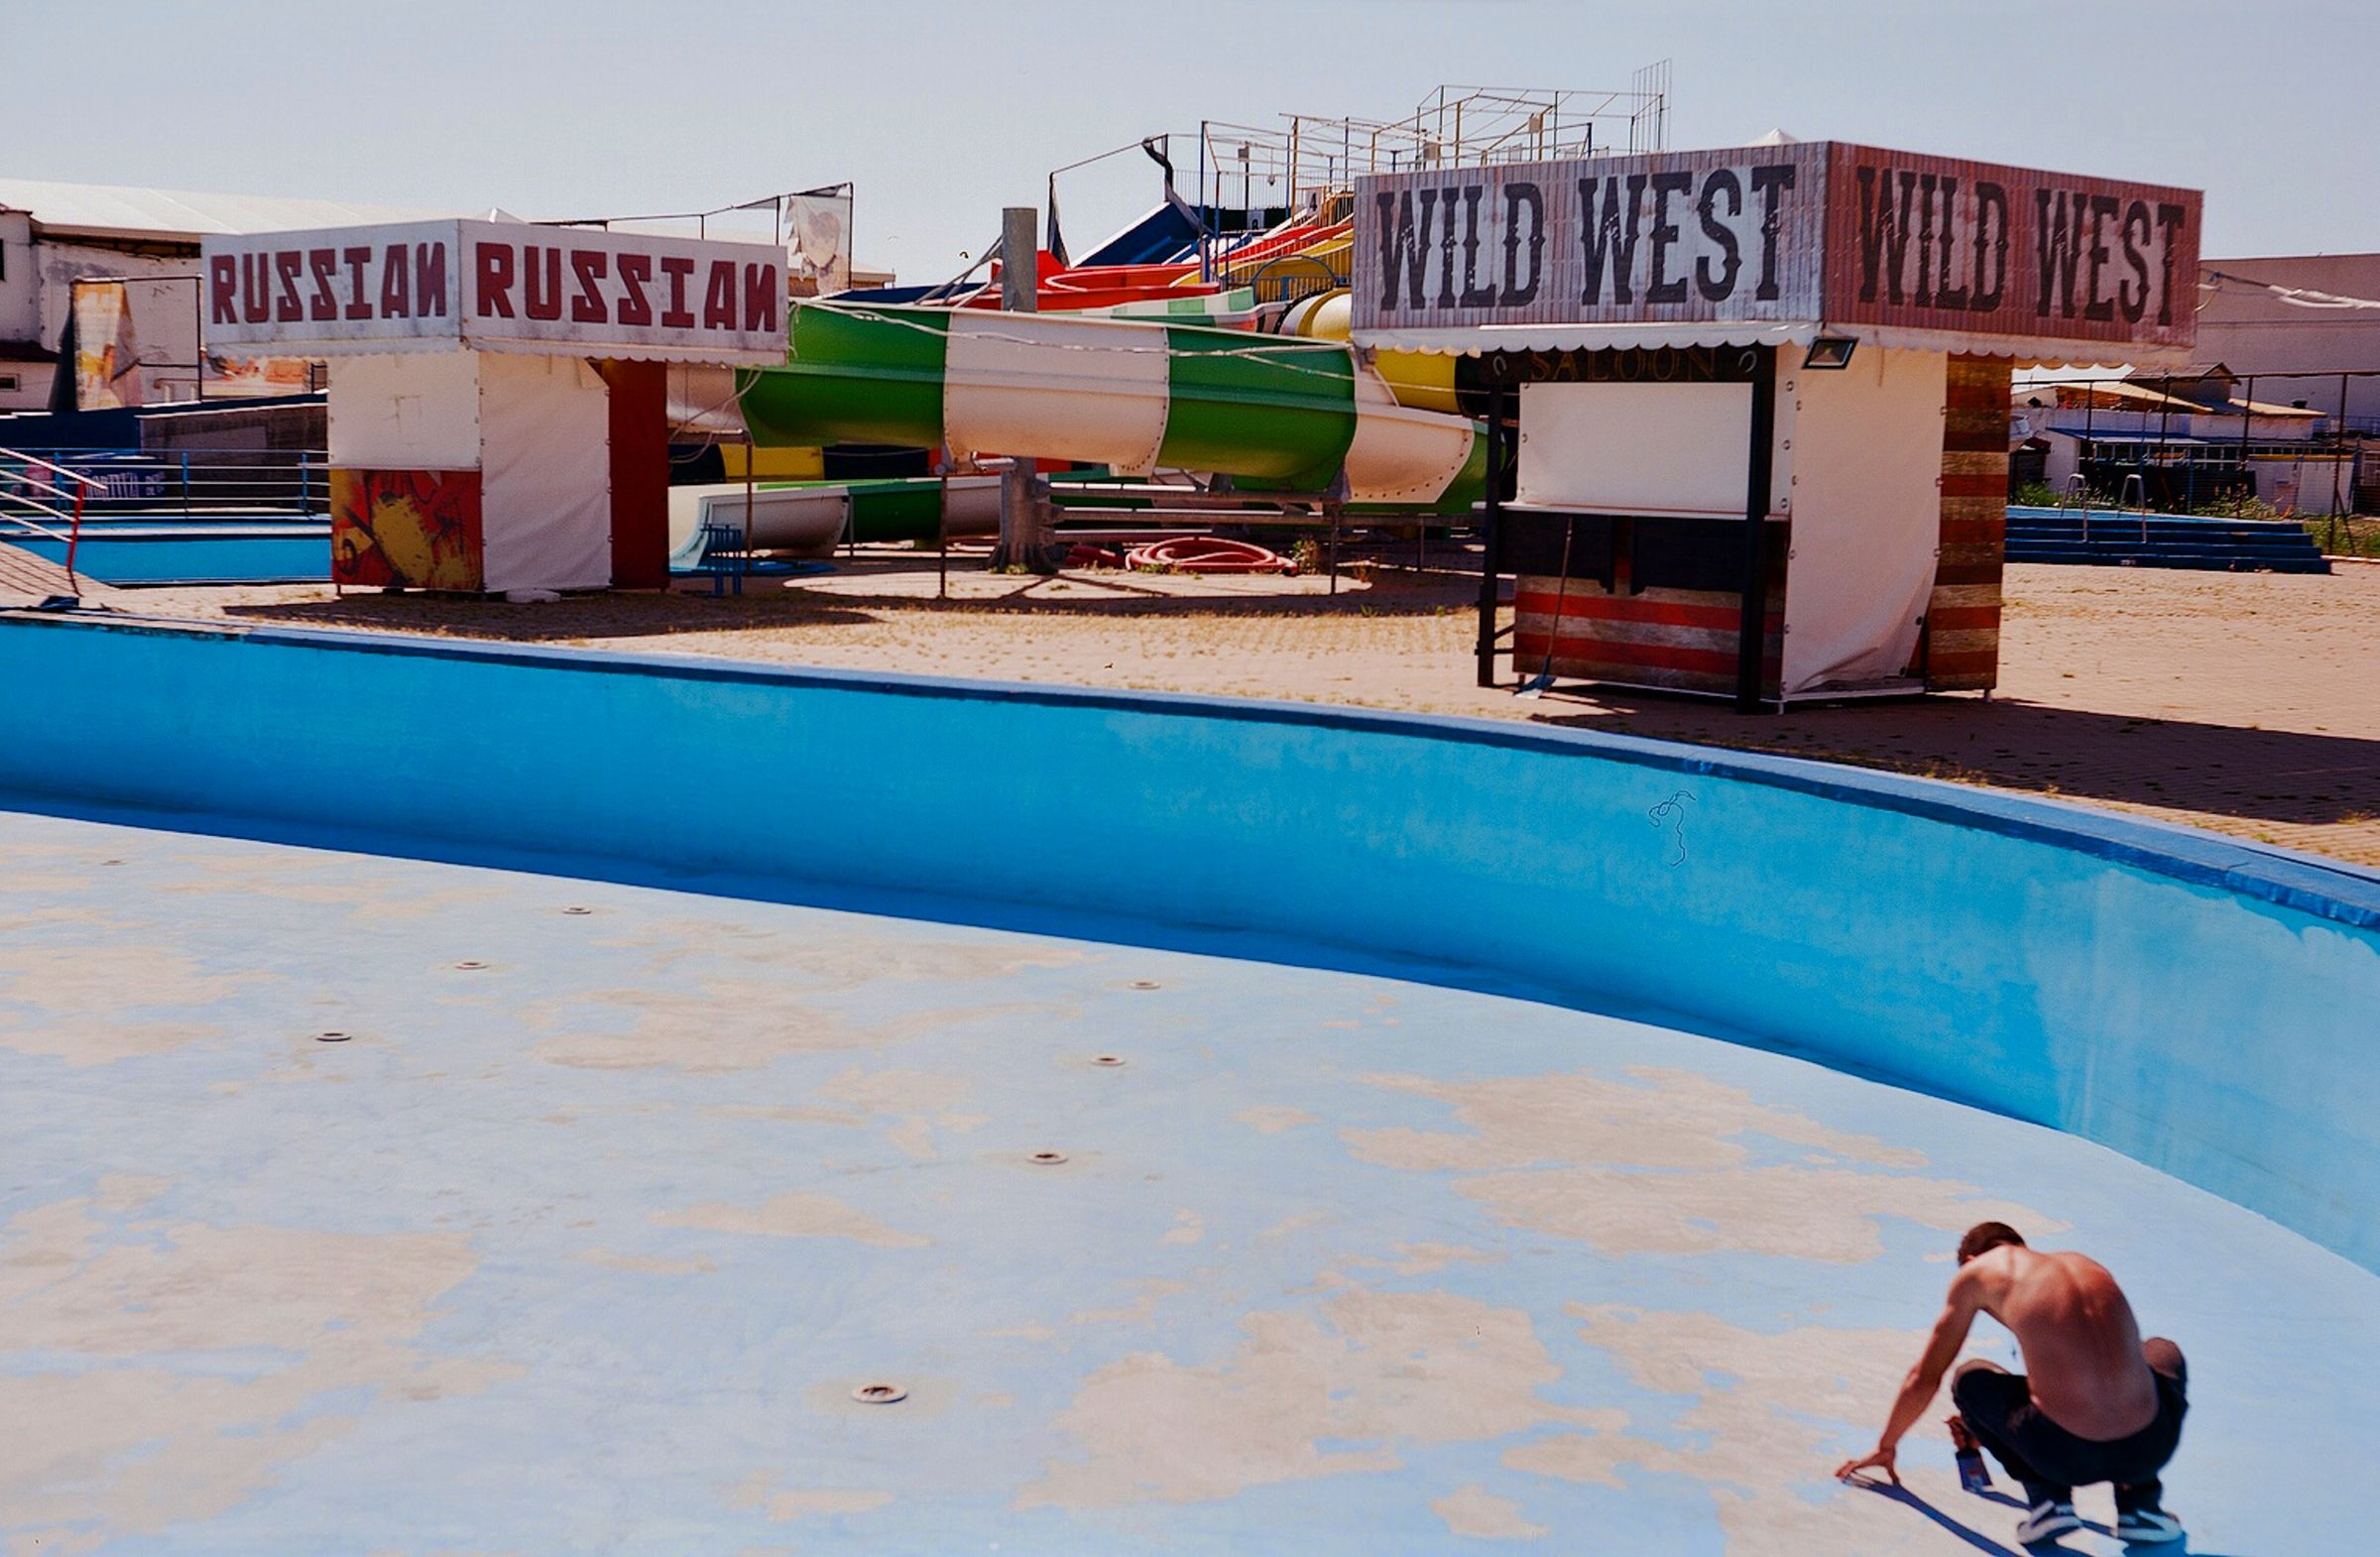 Russian, Wild West